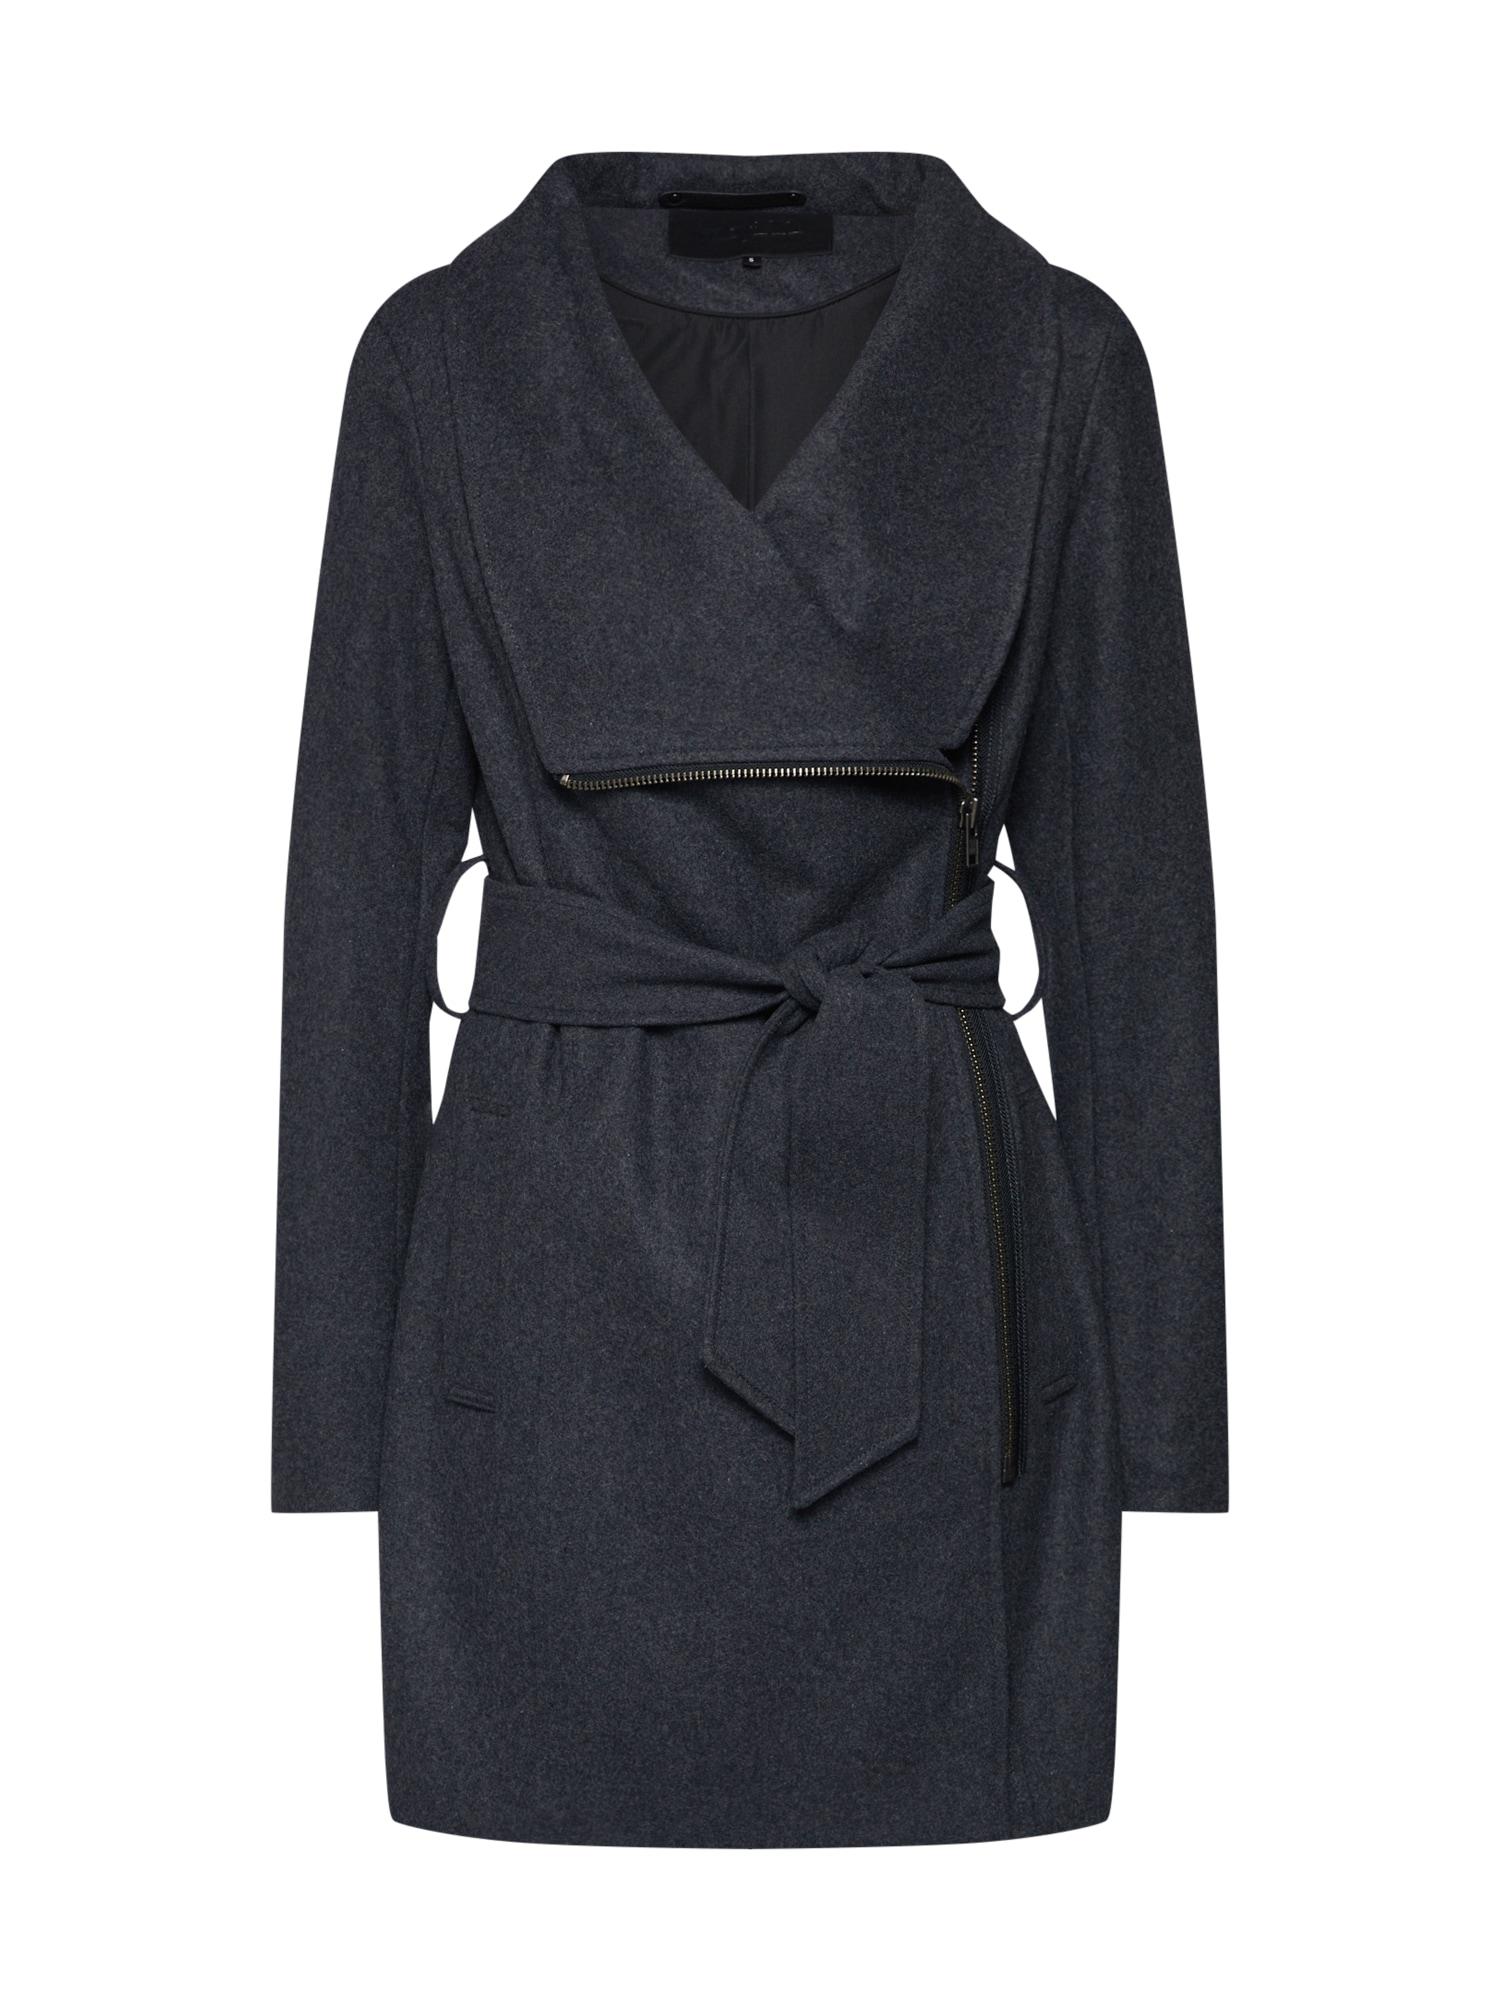 mbym Rudeninis-žieminis paltas 'Mika' pilka